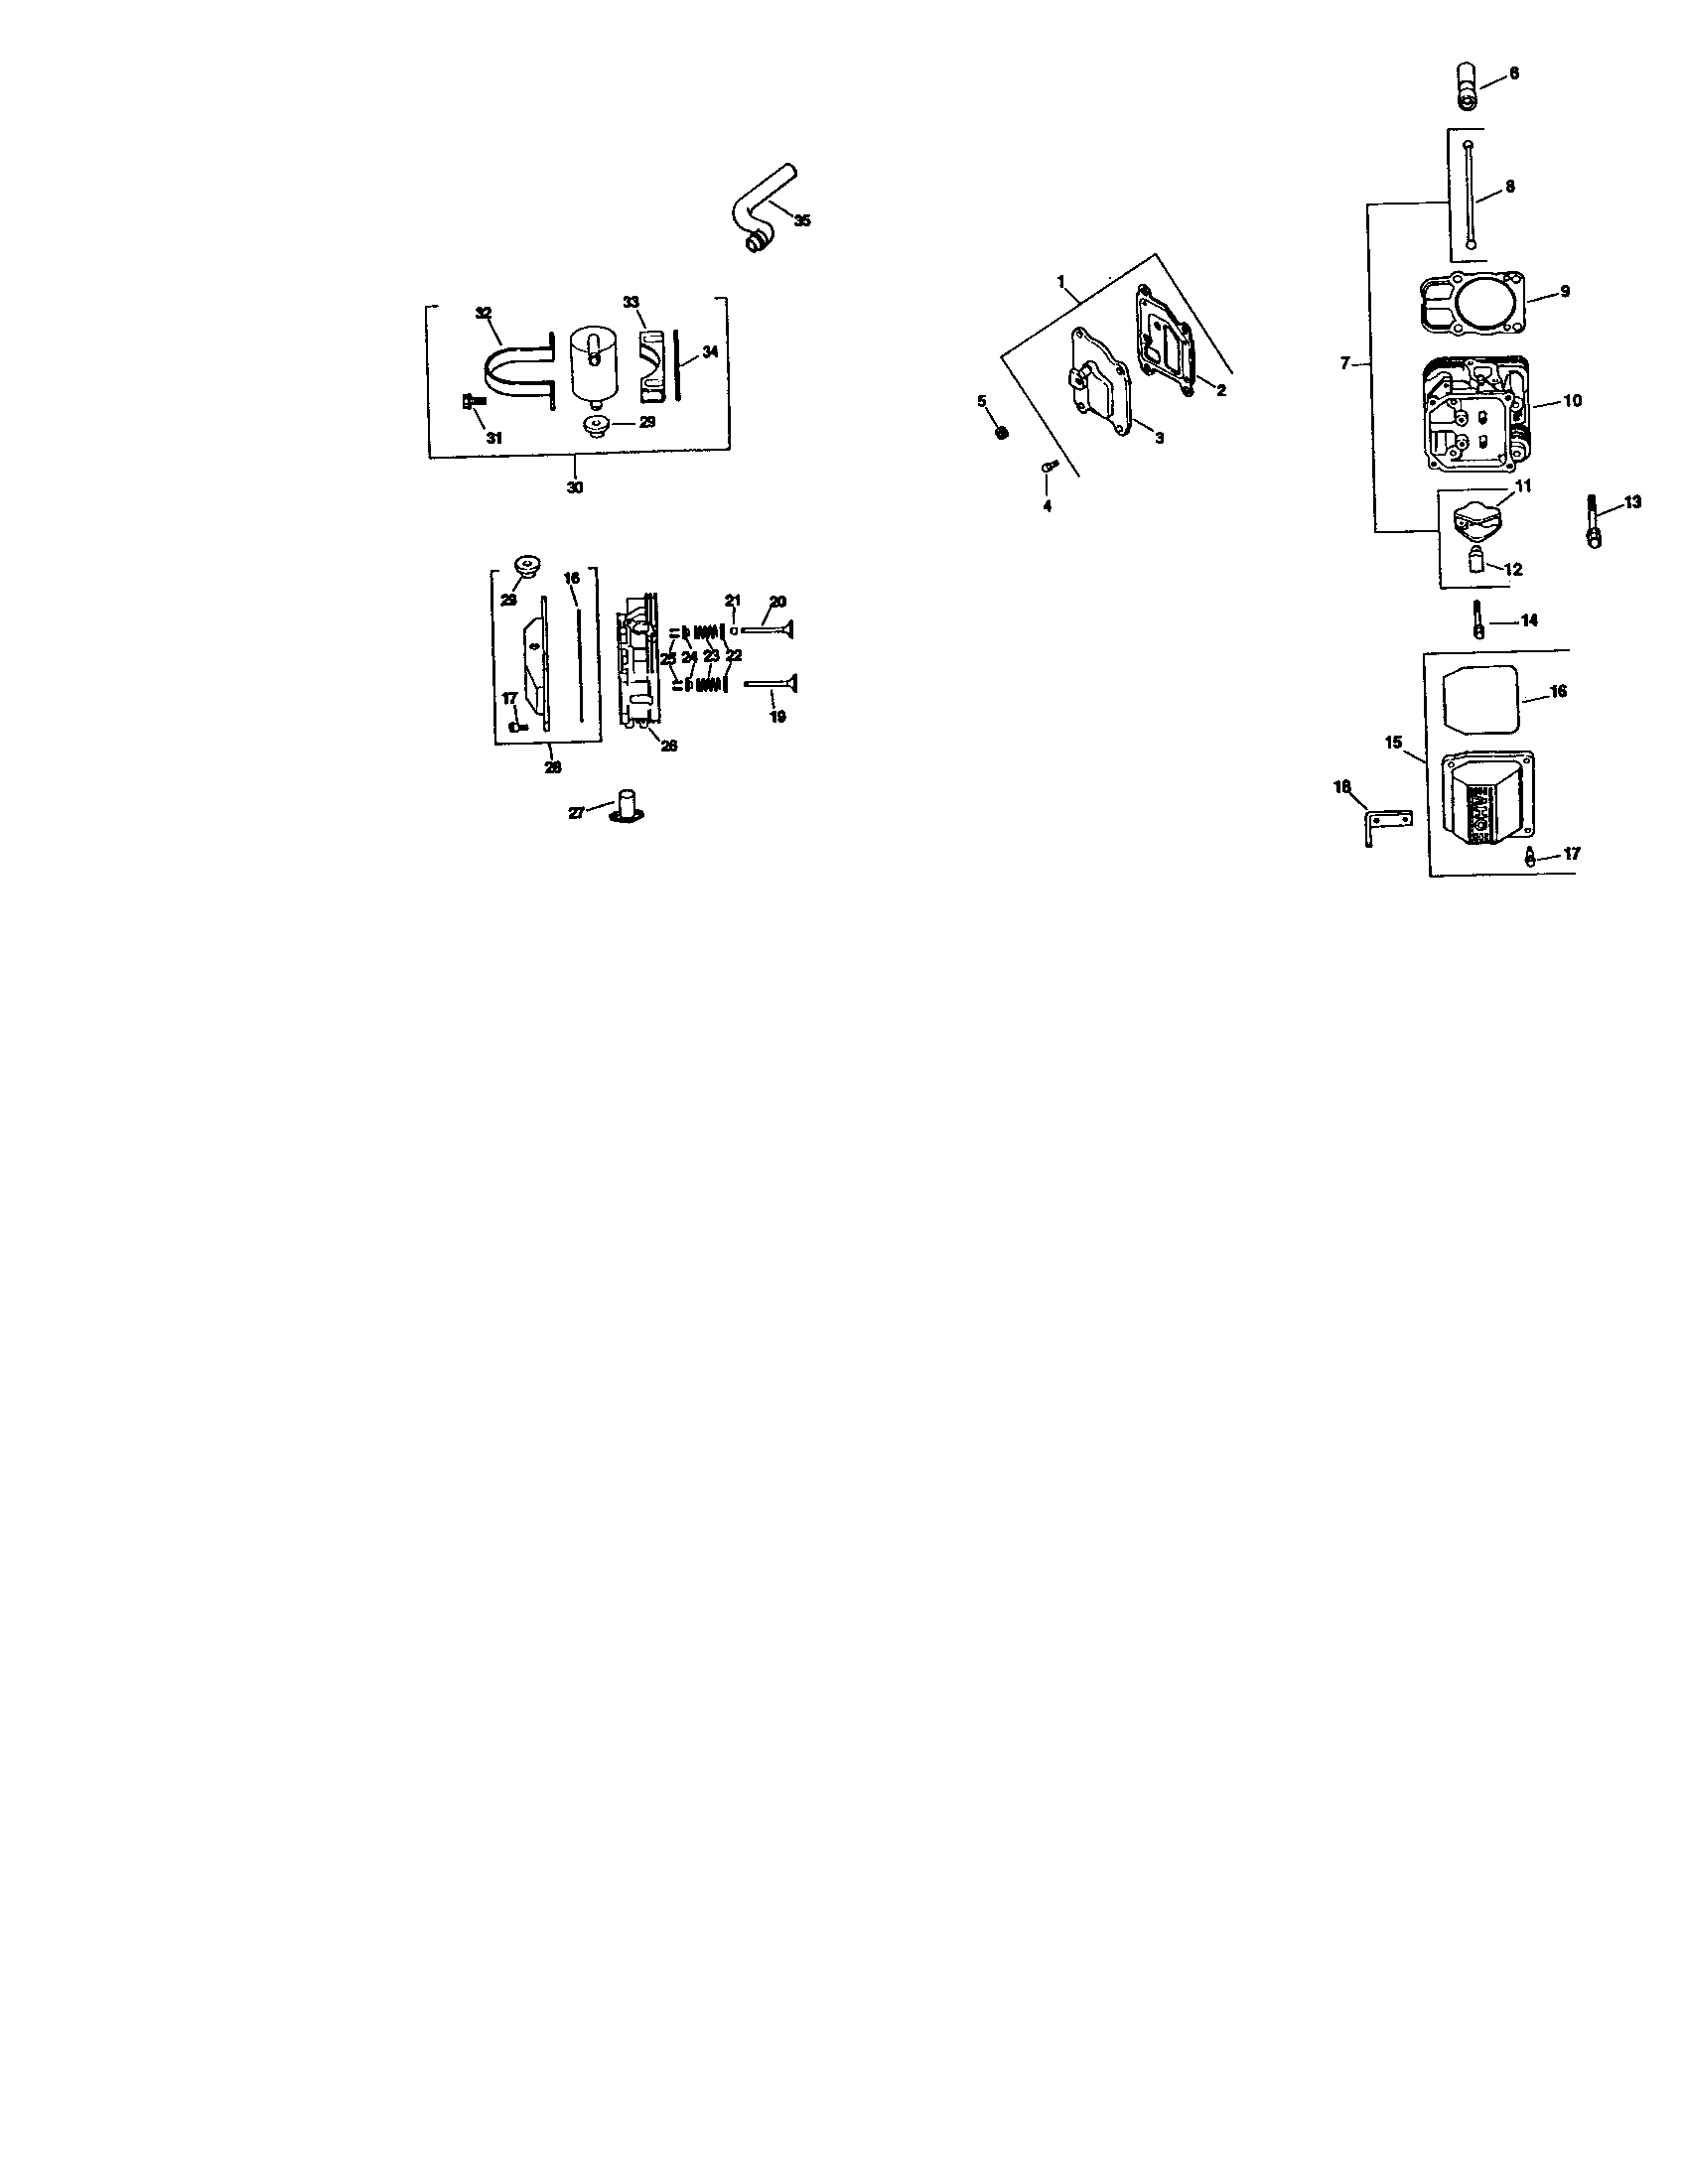 Kohler Command Pro 22 Wiring Diagram Kohler Triad Wiring